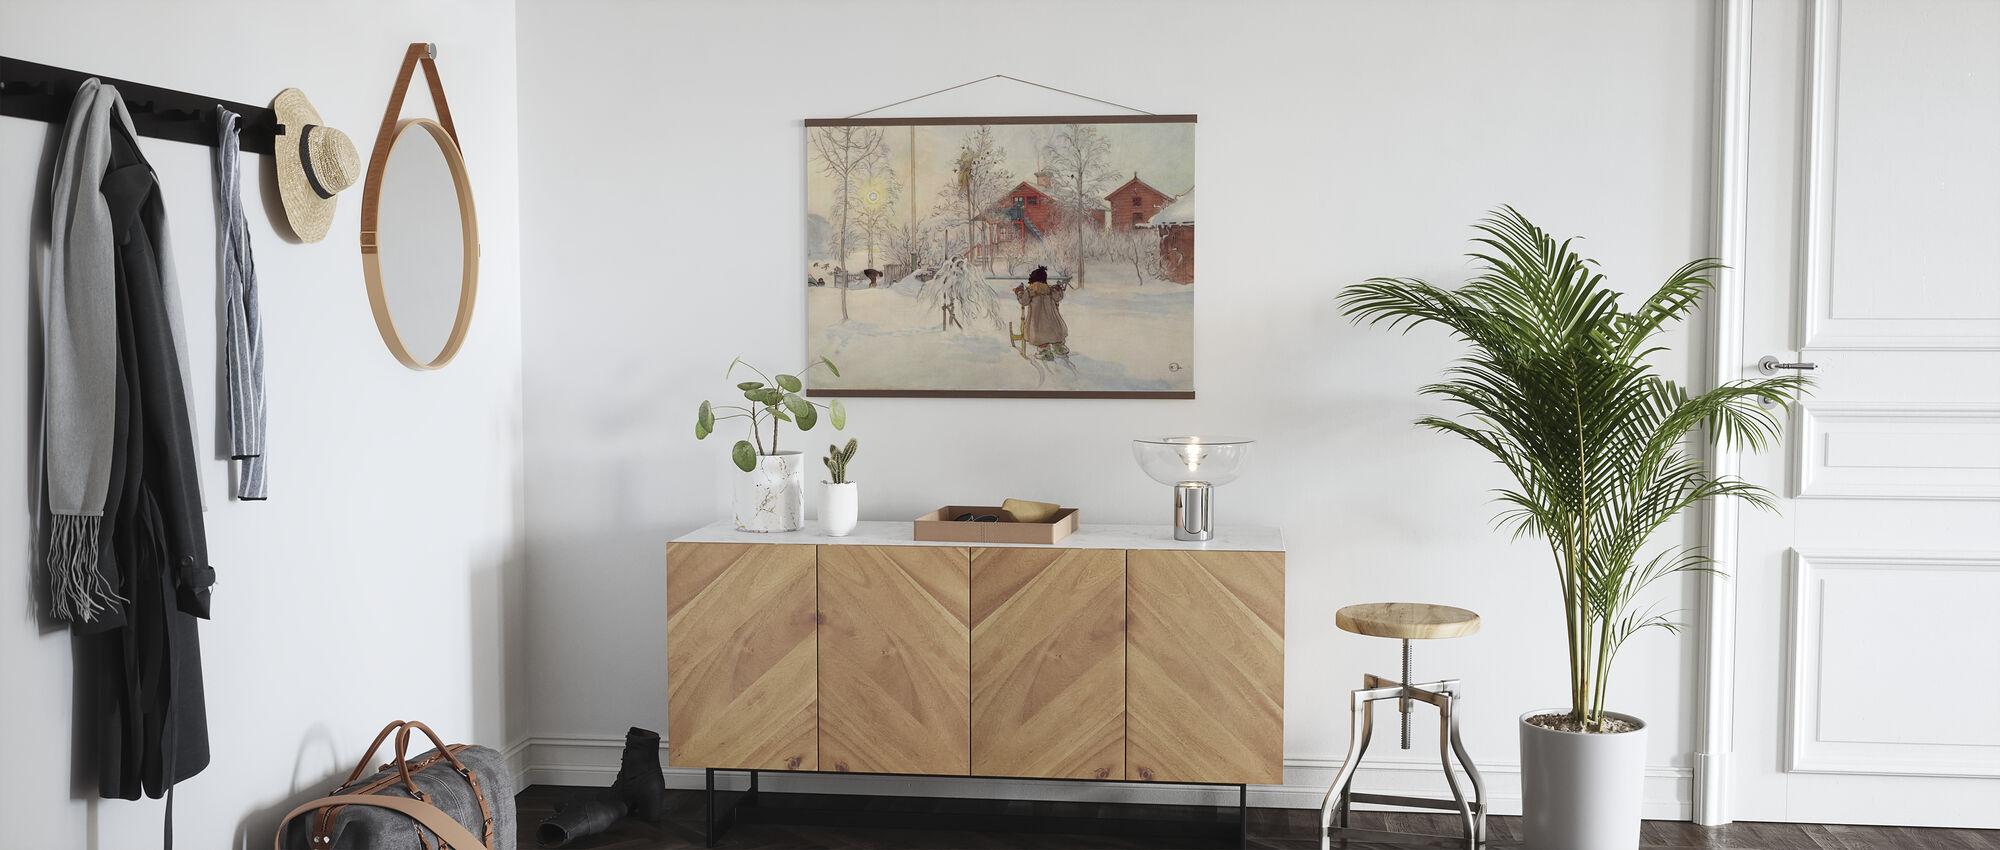 Carl Larsson - Garden ja Bruggen House - Juliste - Aula